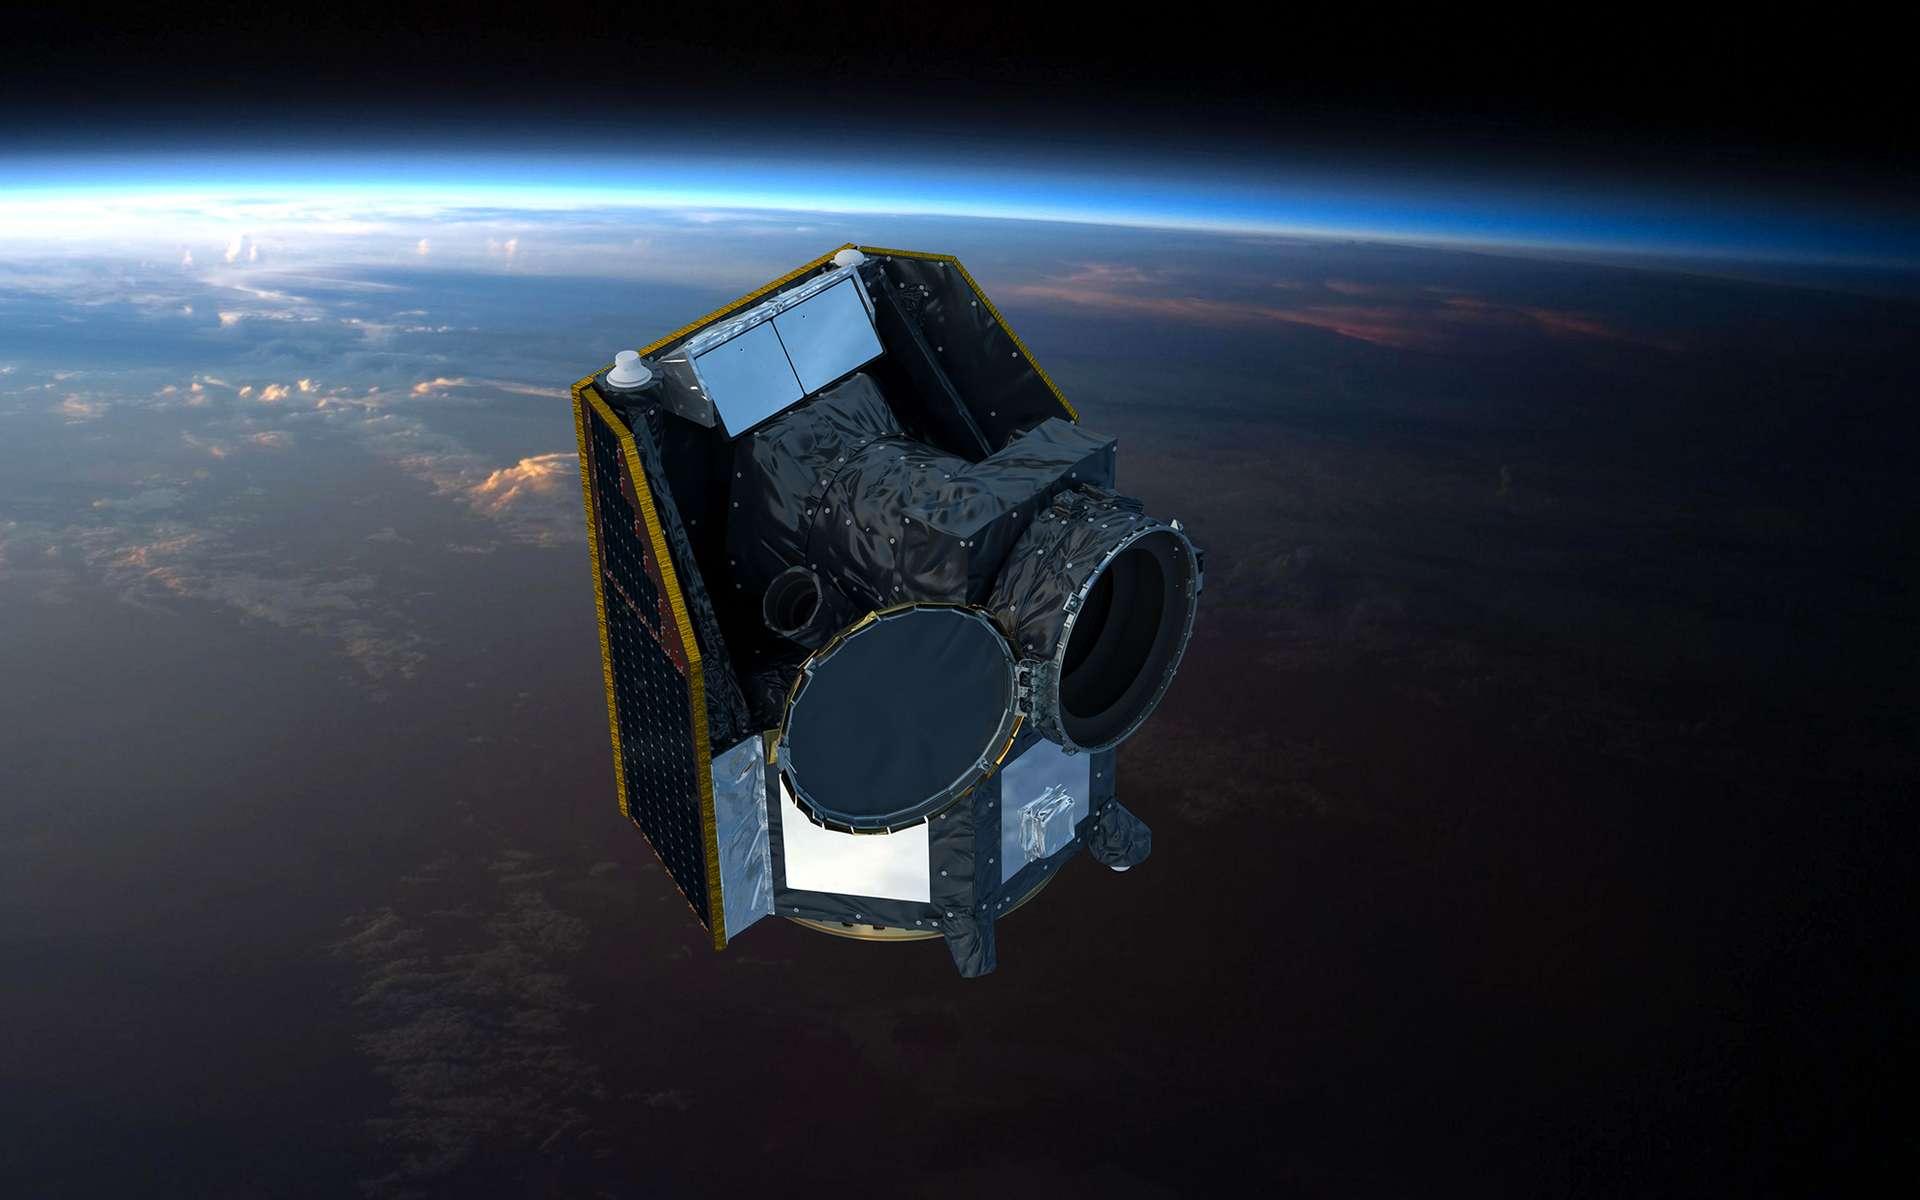 Vue d'artiste du satellite Cheops. © ESA, ATG medialab